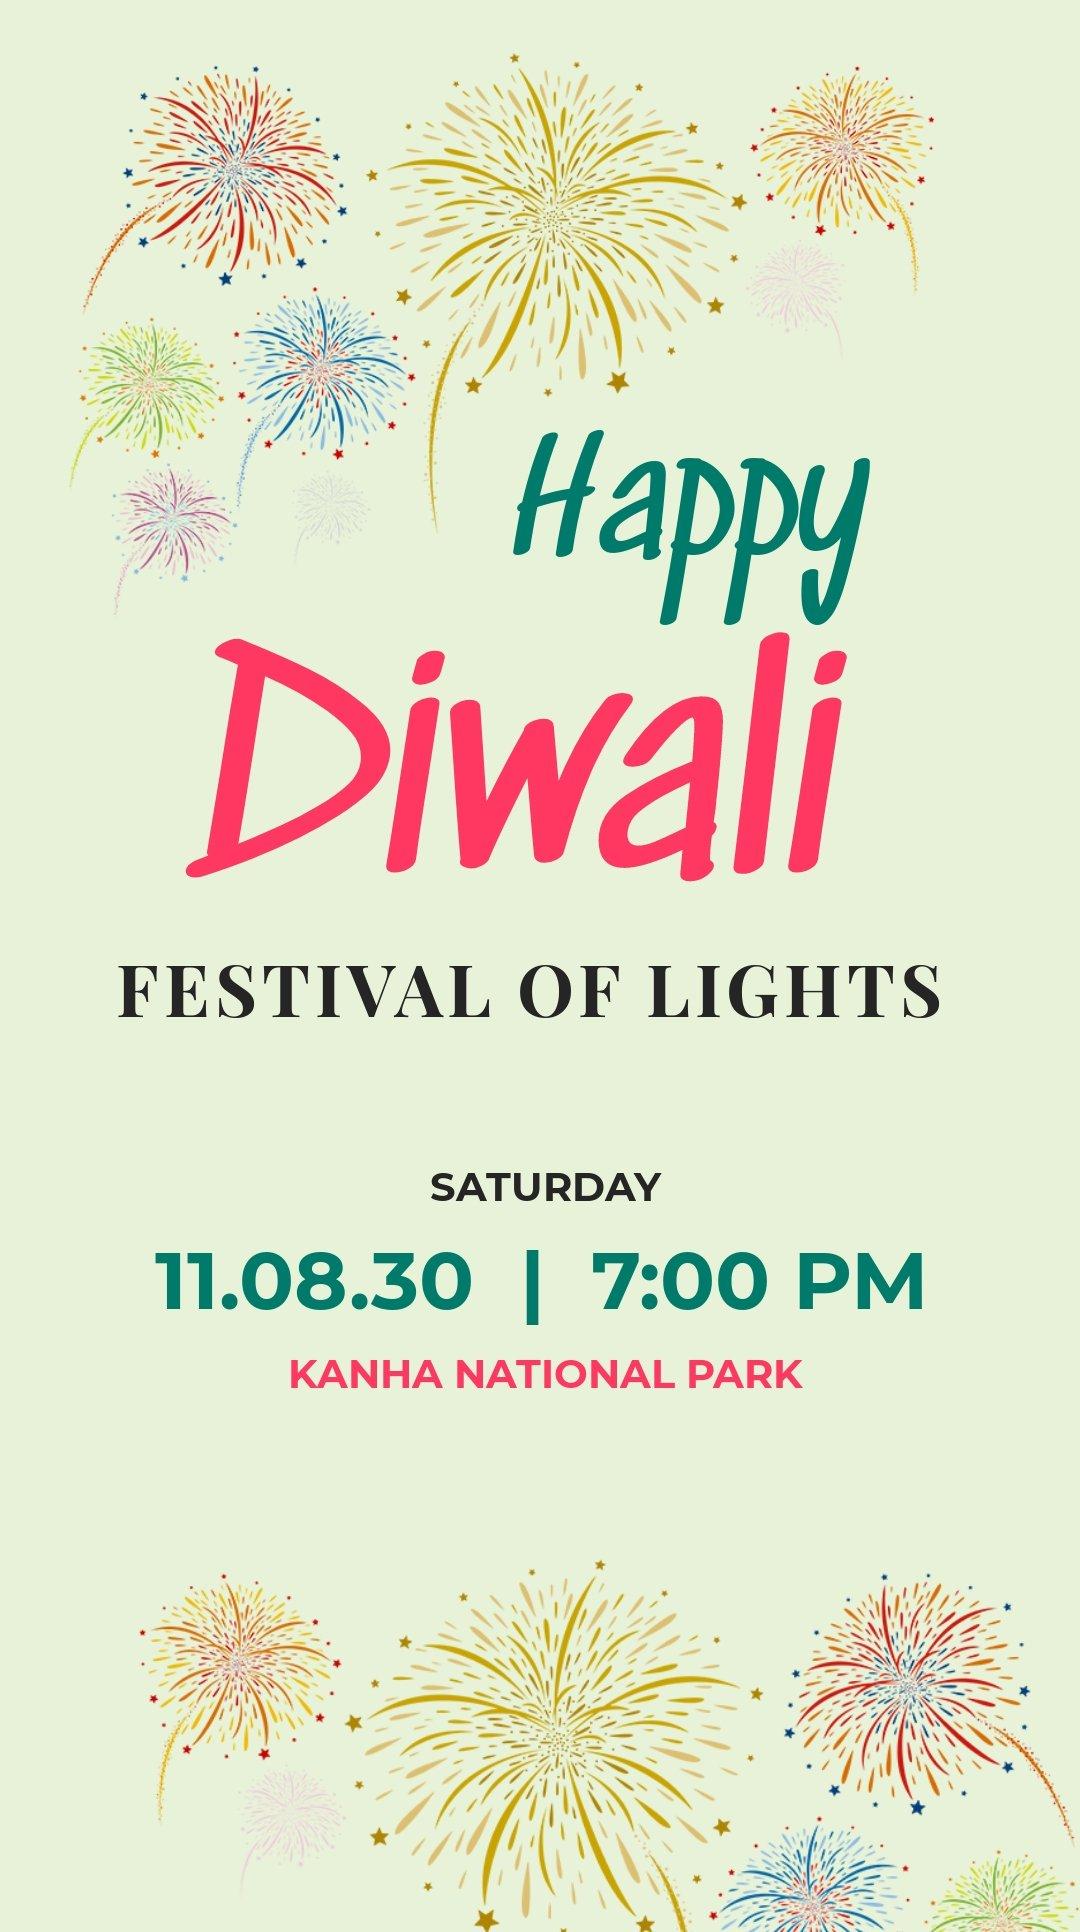 Free Happy Diwali Instagram Story Template.jpe